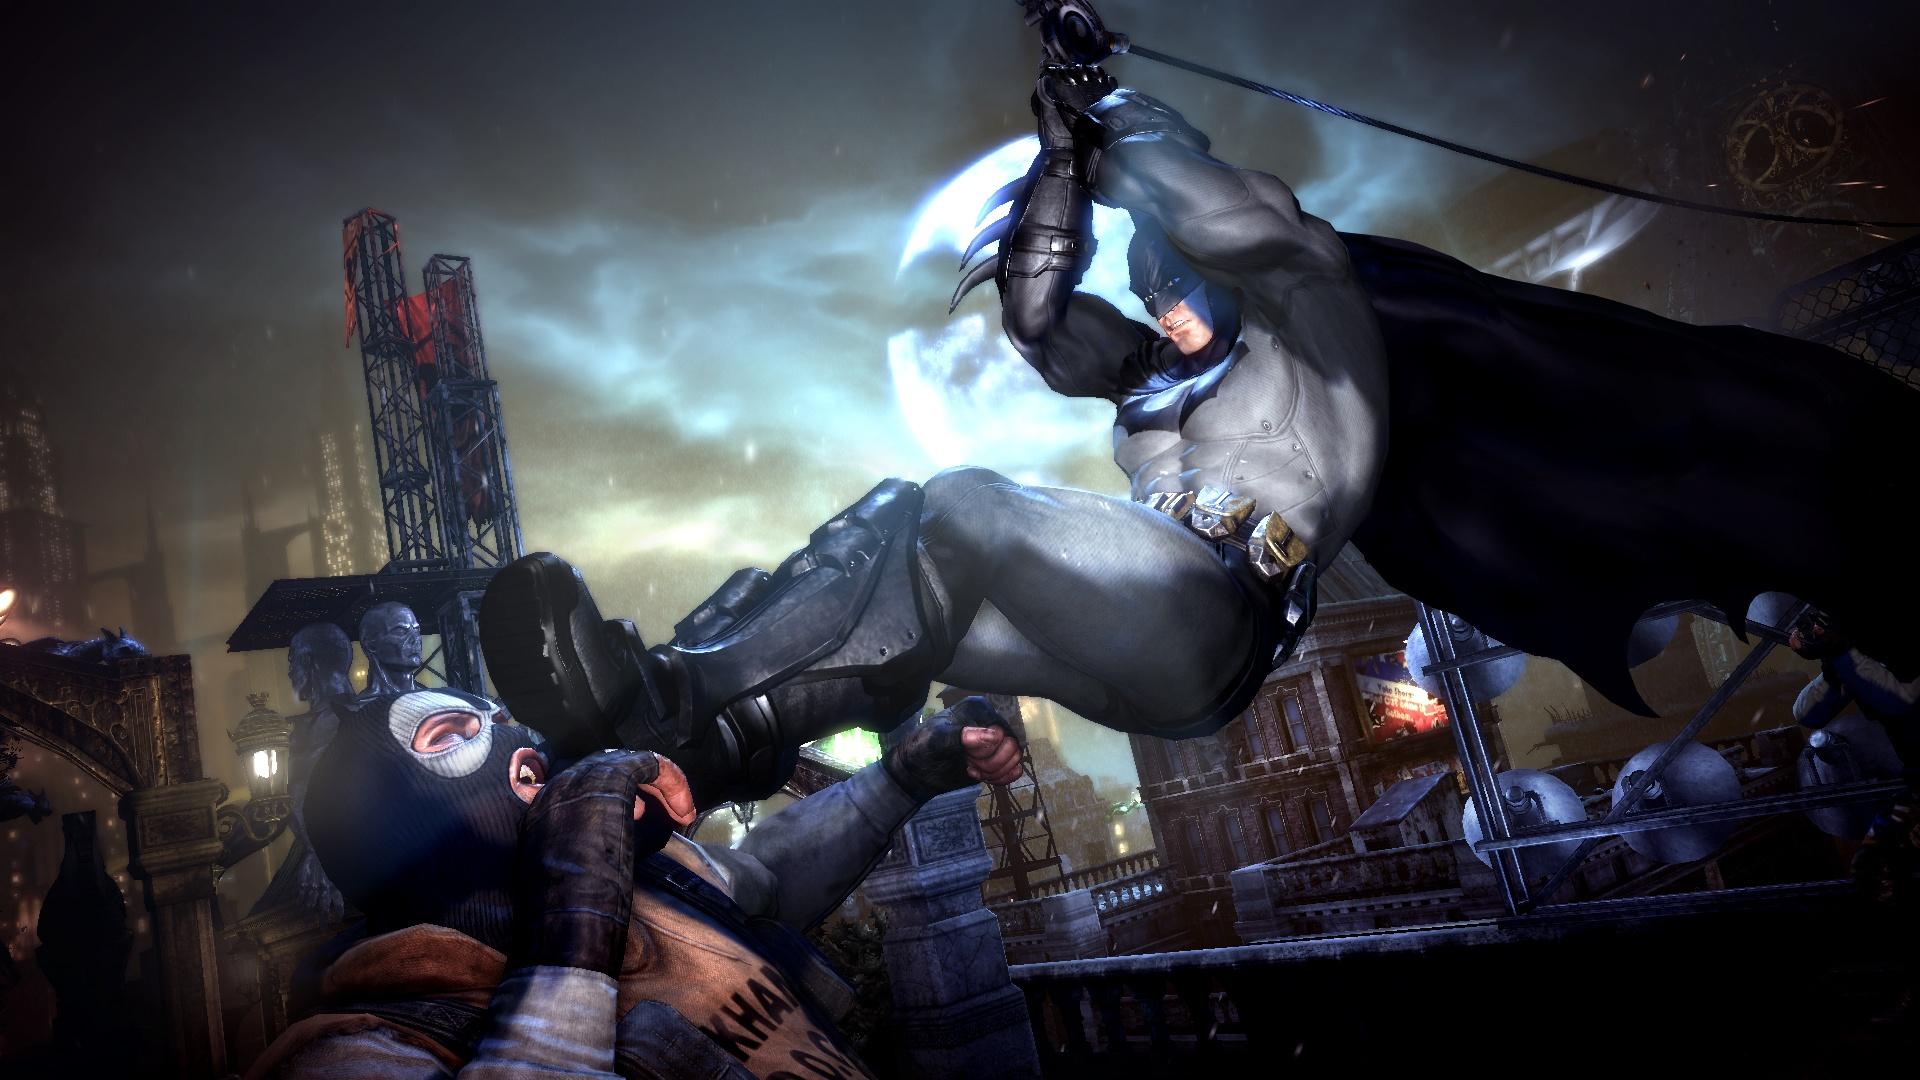 http://4.bp.blogspot.com/-Nqo308krAdU/Tl91F9XswsI/AAAAAAAAZG0/1BfHGG2zpO8/d/Batman+-+Arkham+City+Wallpapers+%25283%2529.jpg